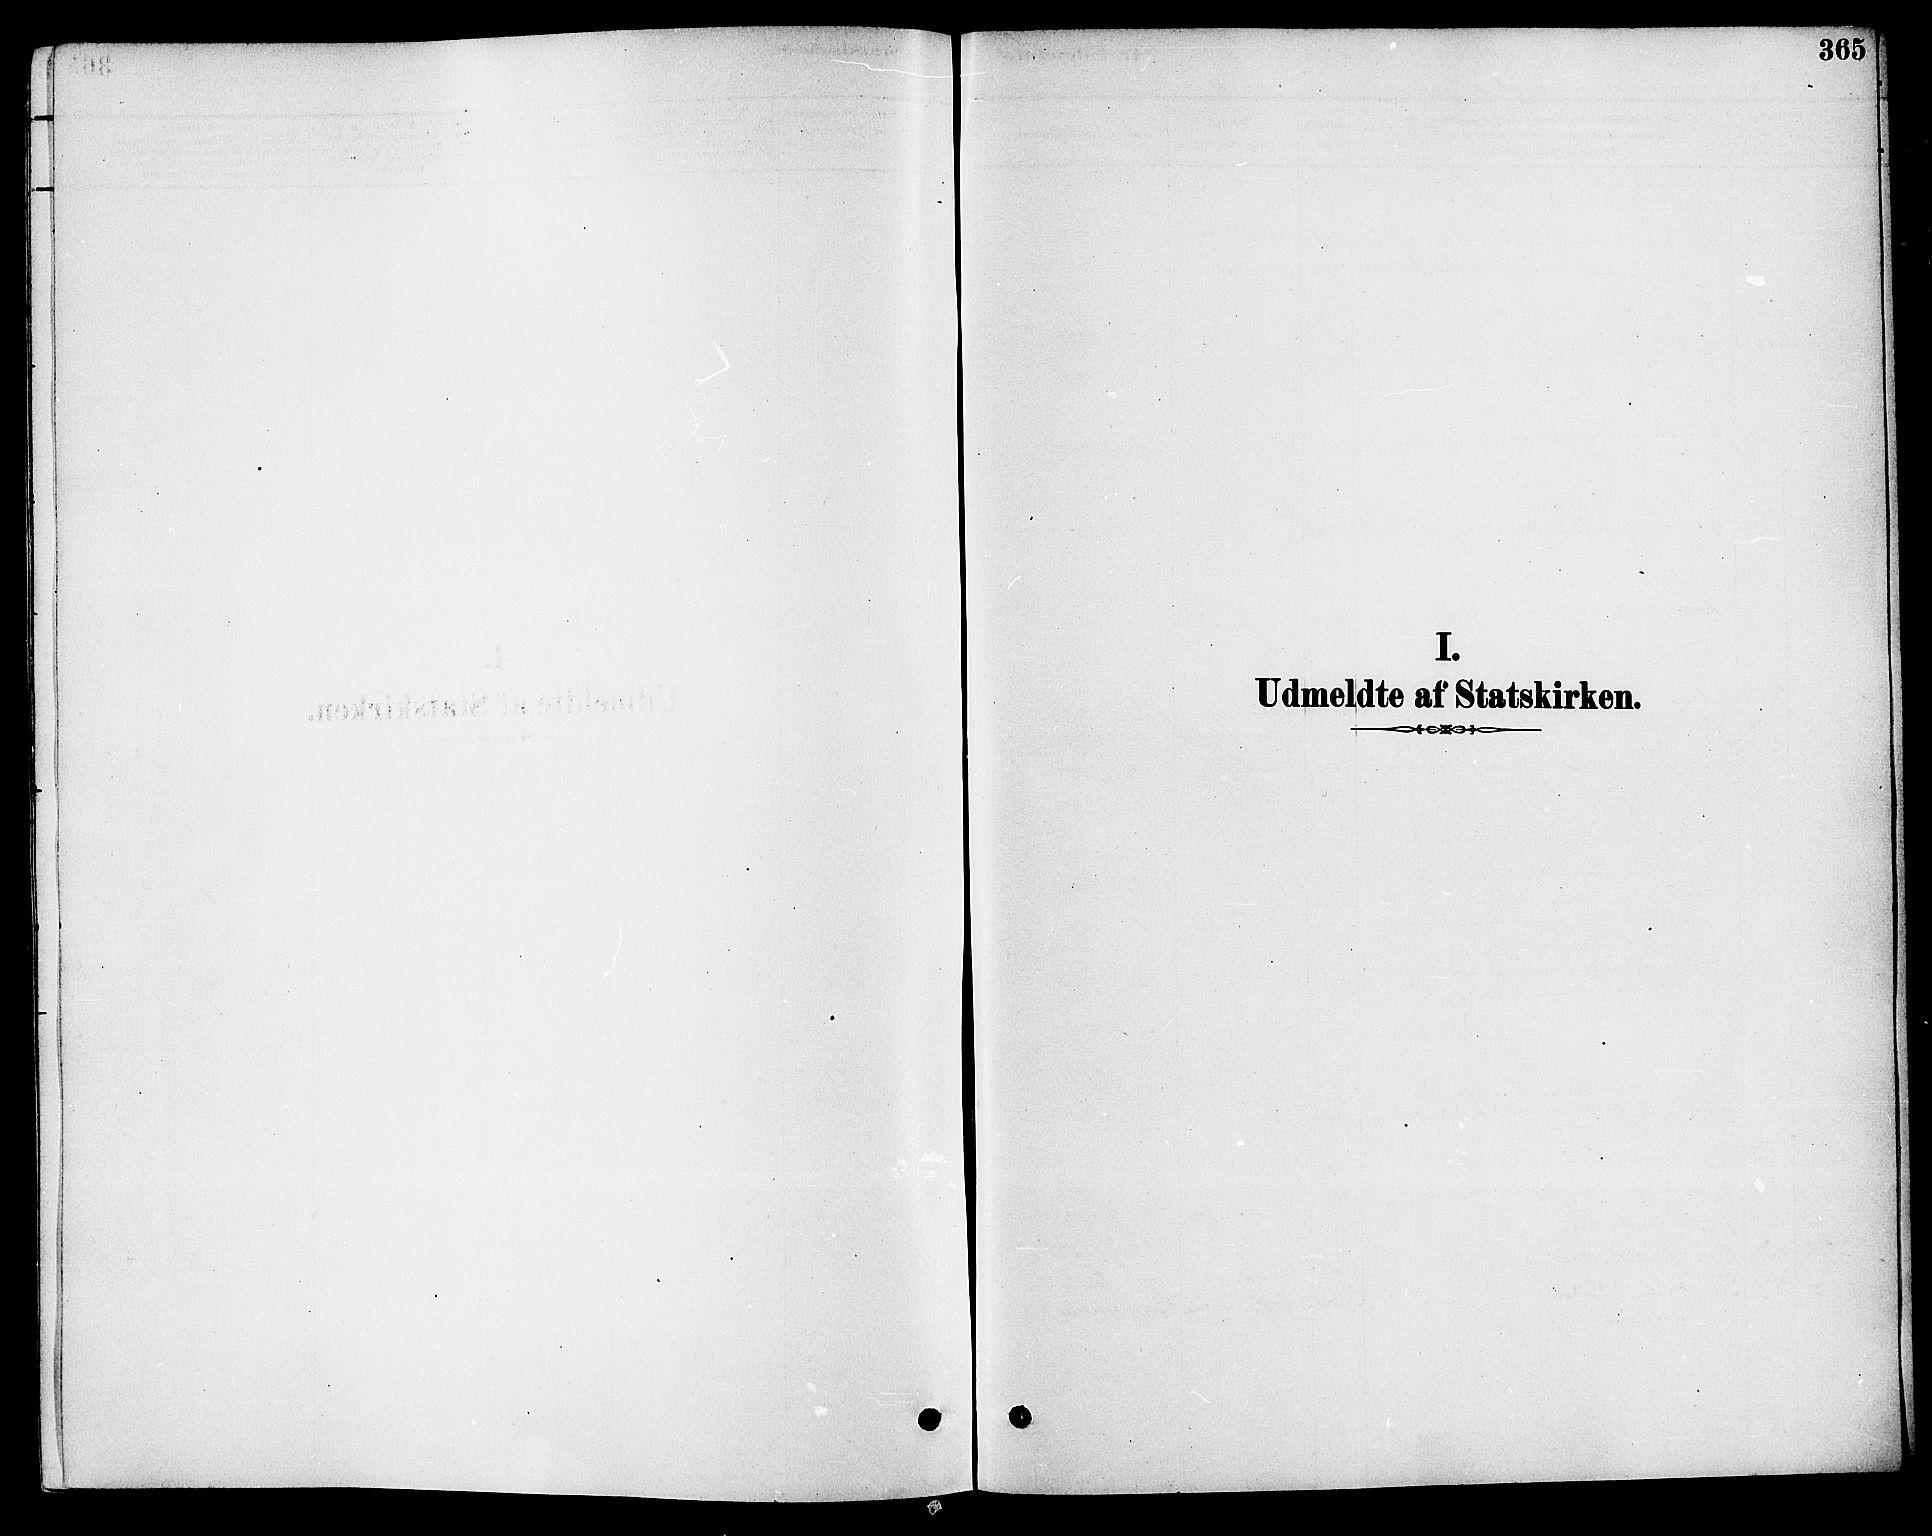 SAKO, Solum kirkebøker, F/Fa/L0009: Ministerialbok nr. I 9, 1877-1887, s. 365